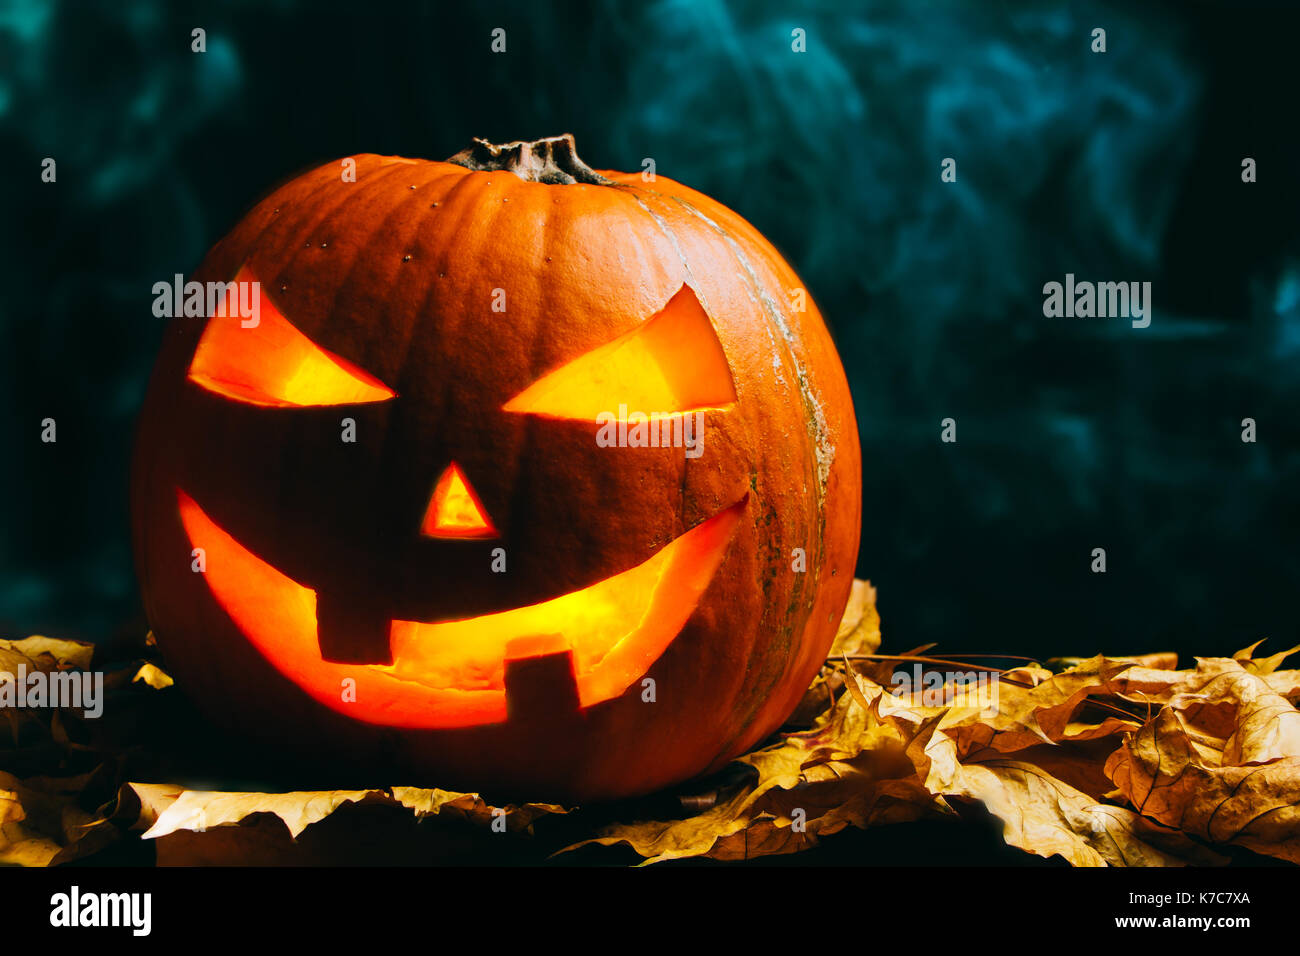 Halloween pumpkin lantern with dry leaves on a smoky dark background Stock Photo